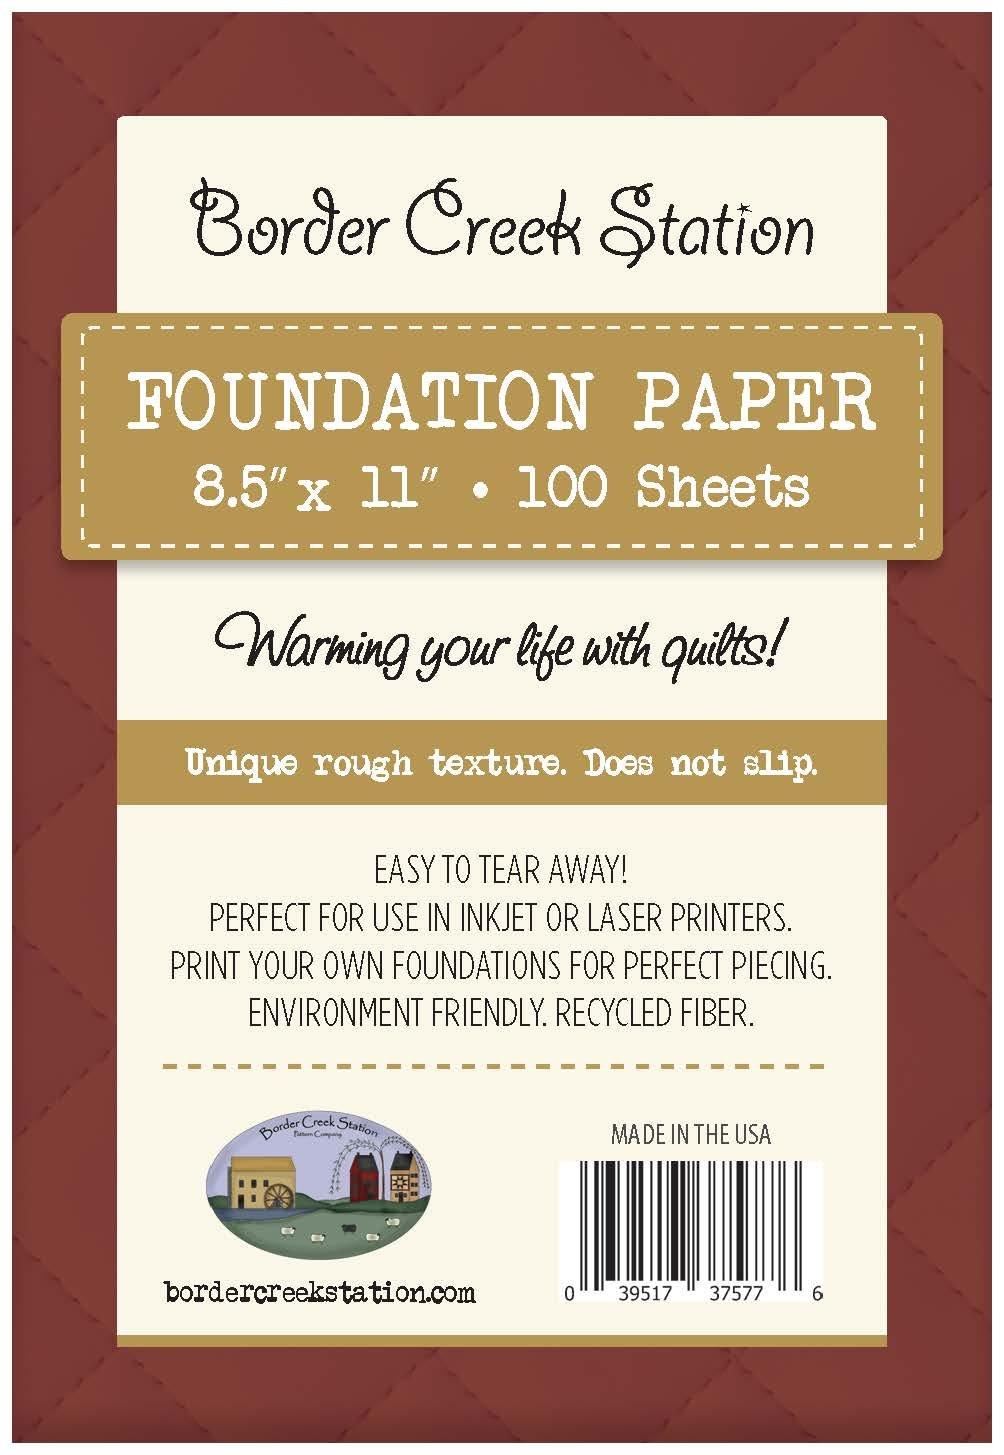 BCS Foundation Paper - 100 sheet pkg. 8.5 x 11